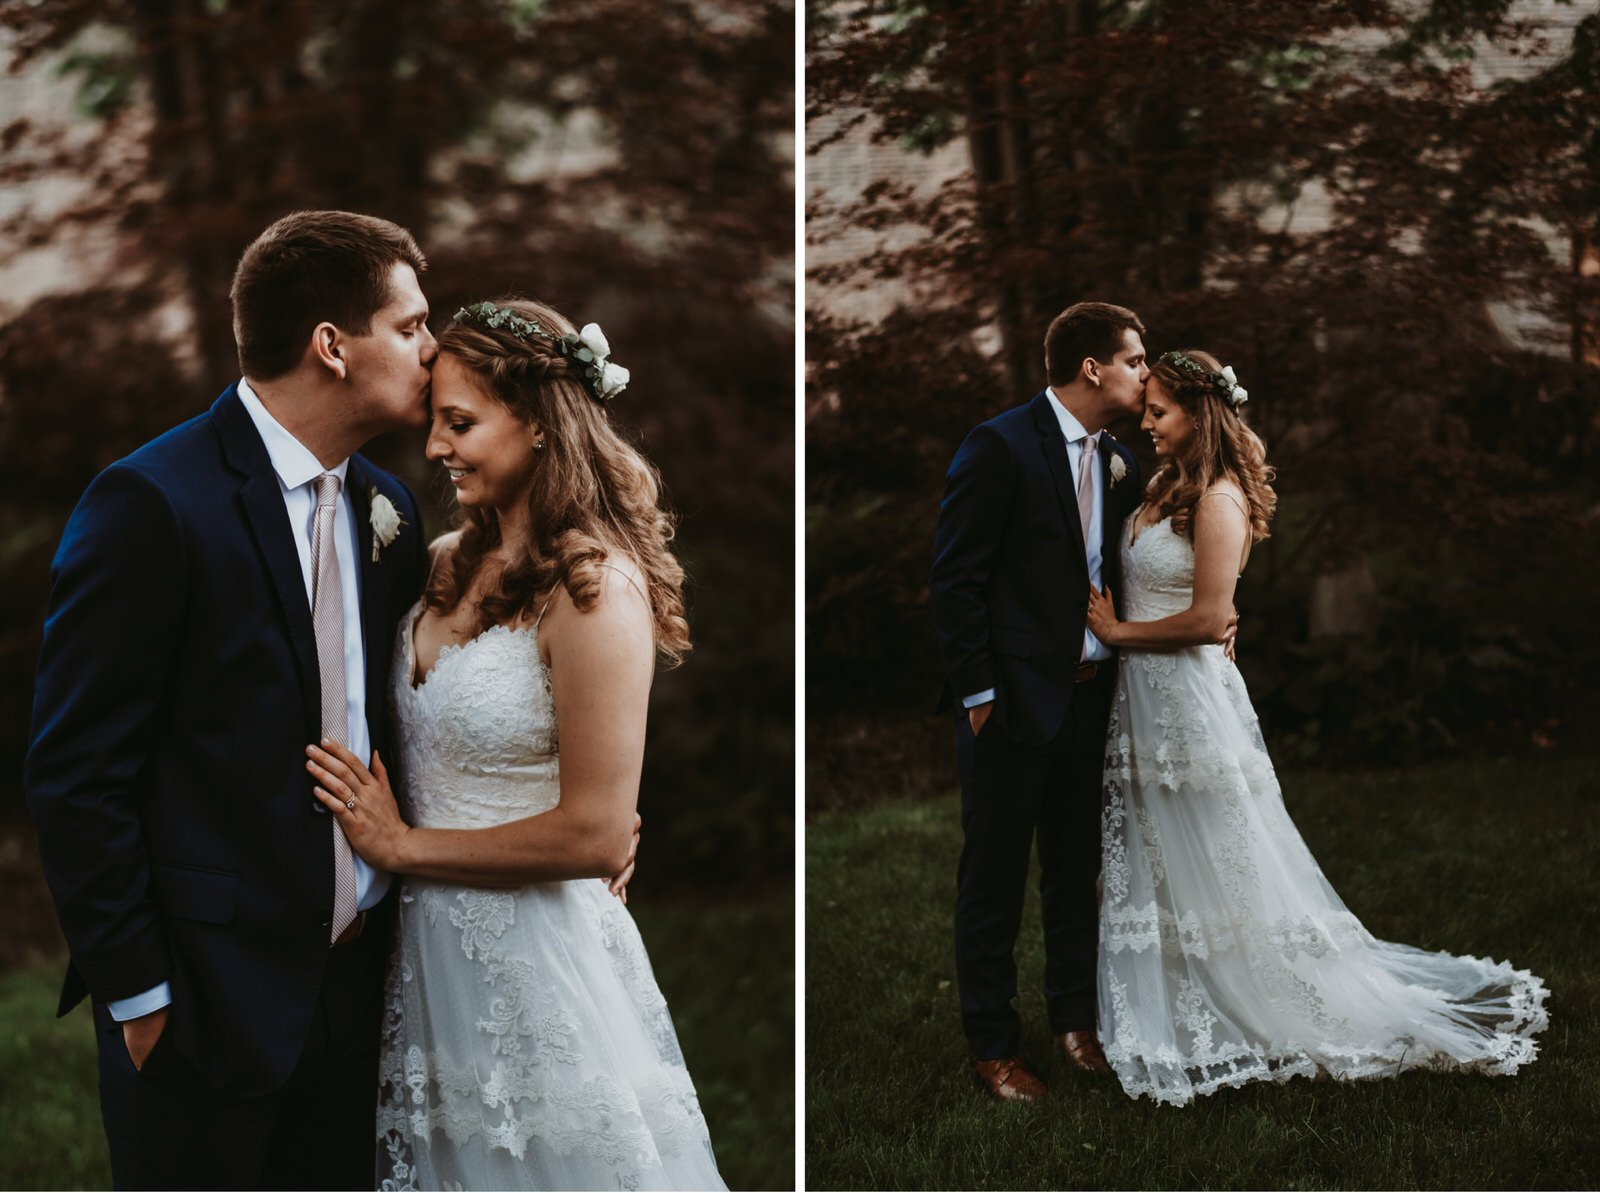 chicago backyard wedding photographer, bride and groom